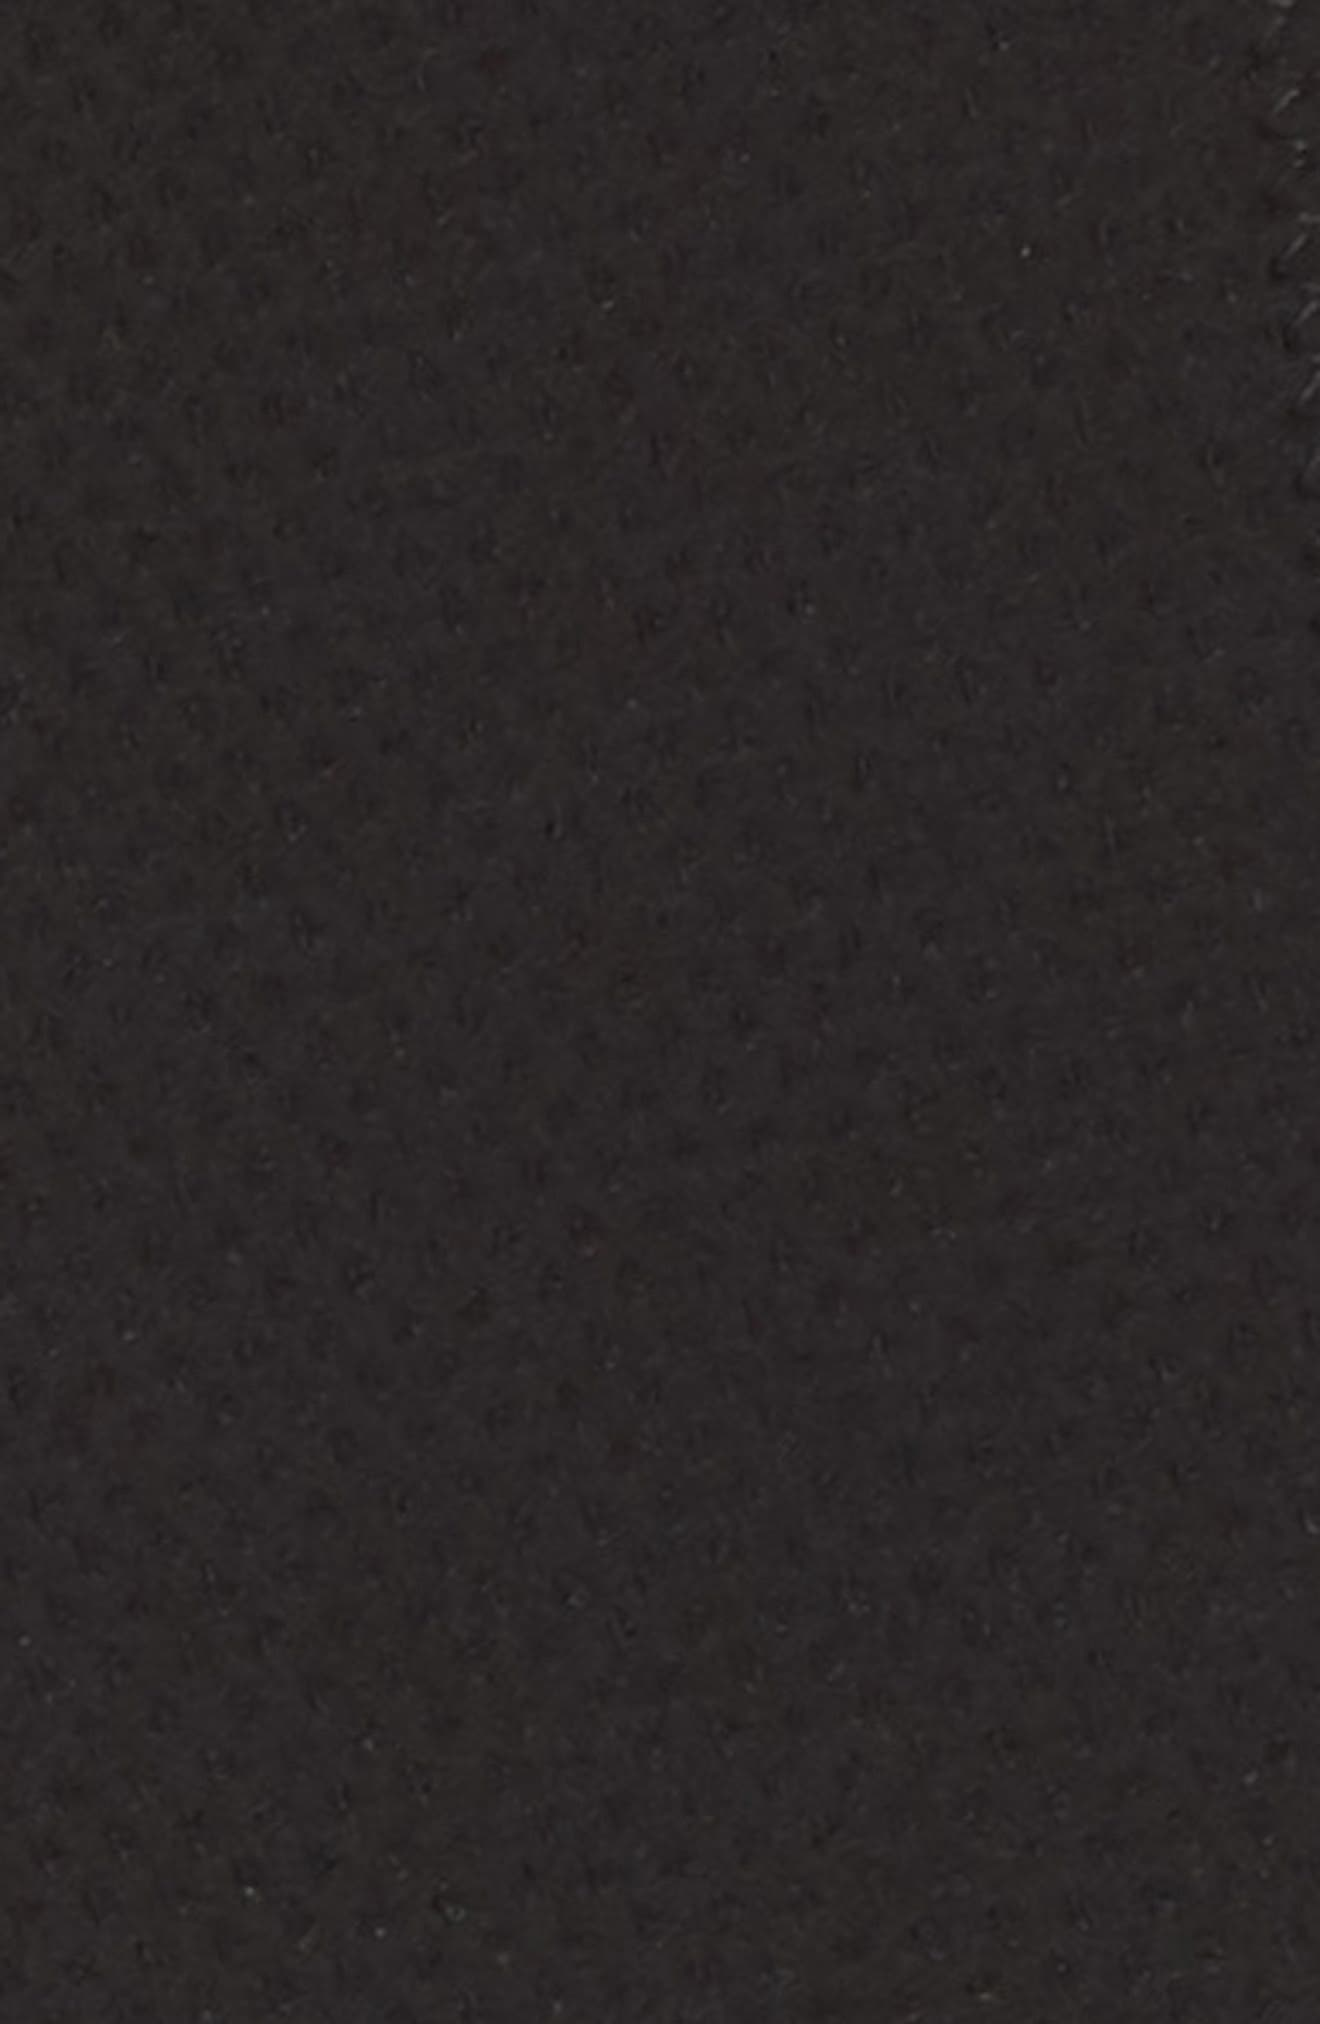 J.Crew Piqué Hipster Bikini Bottoms,                             Alternate thumbnail 5, color,                             Black